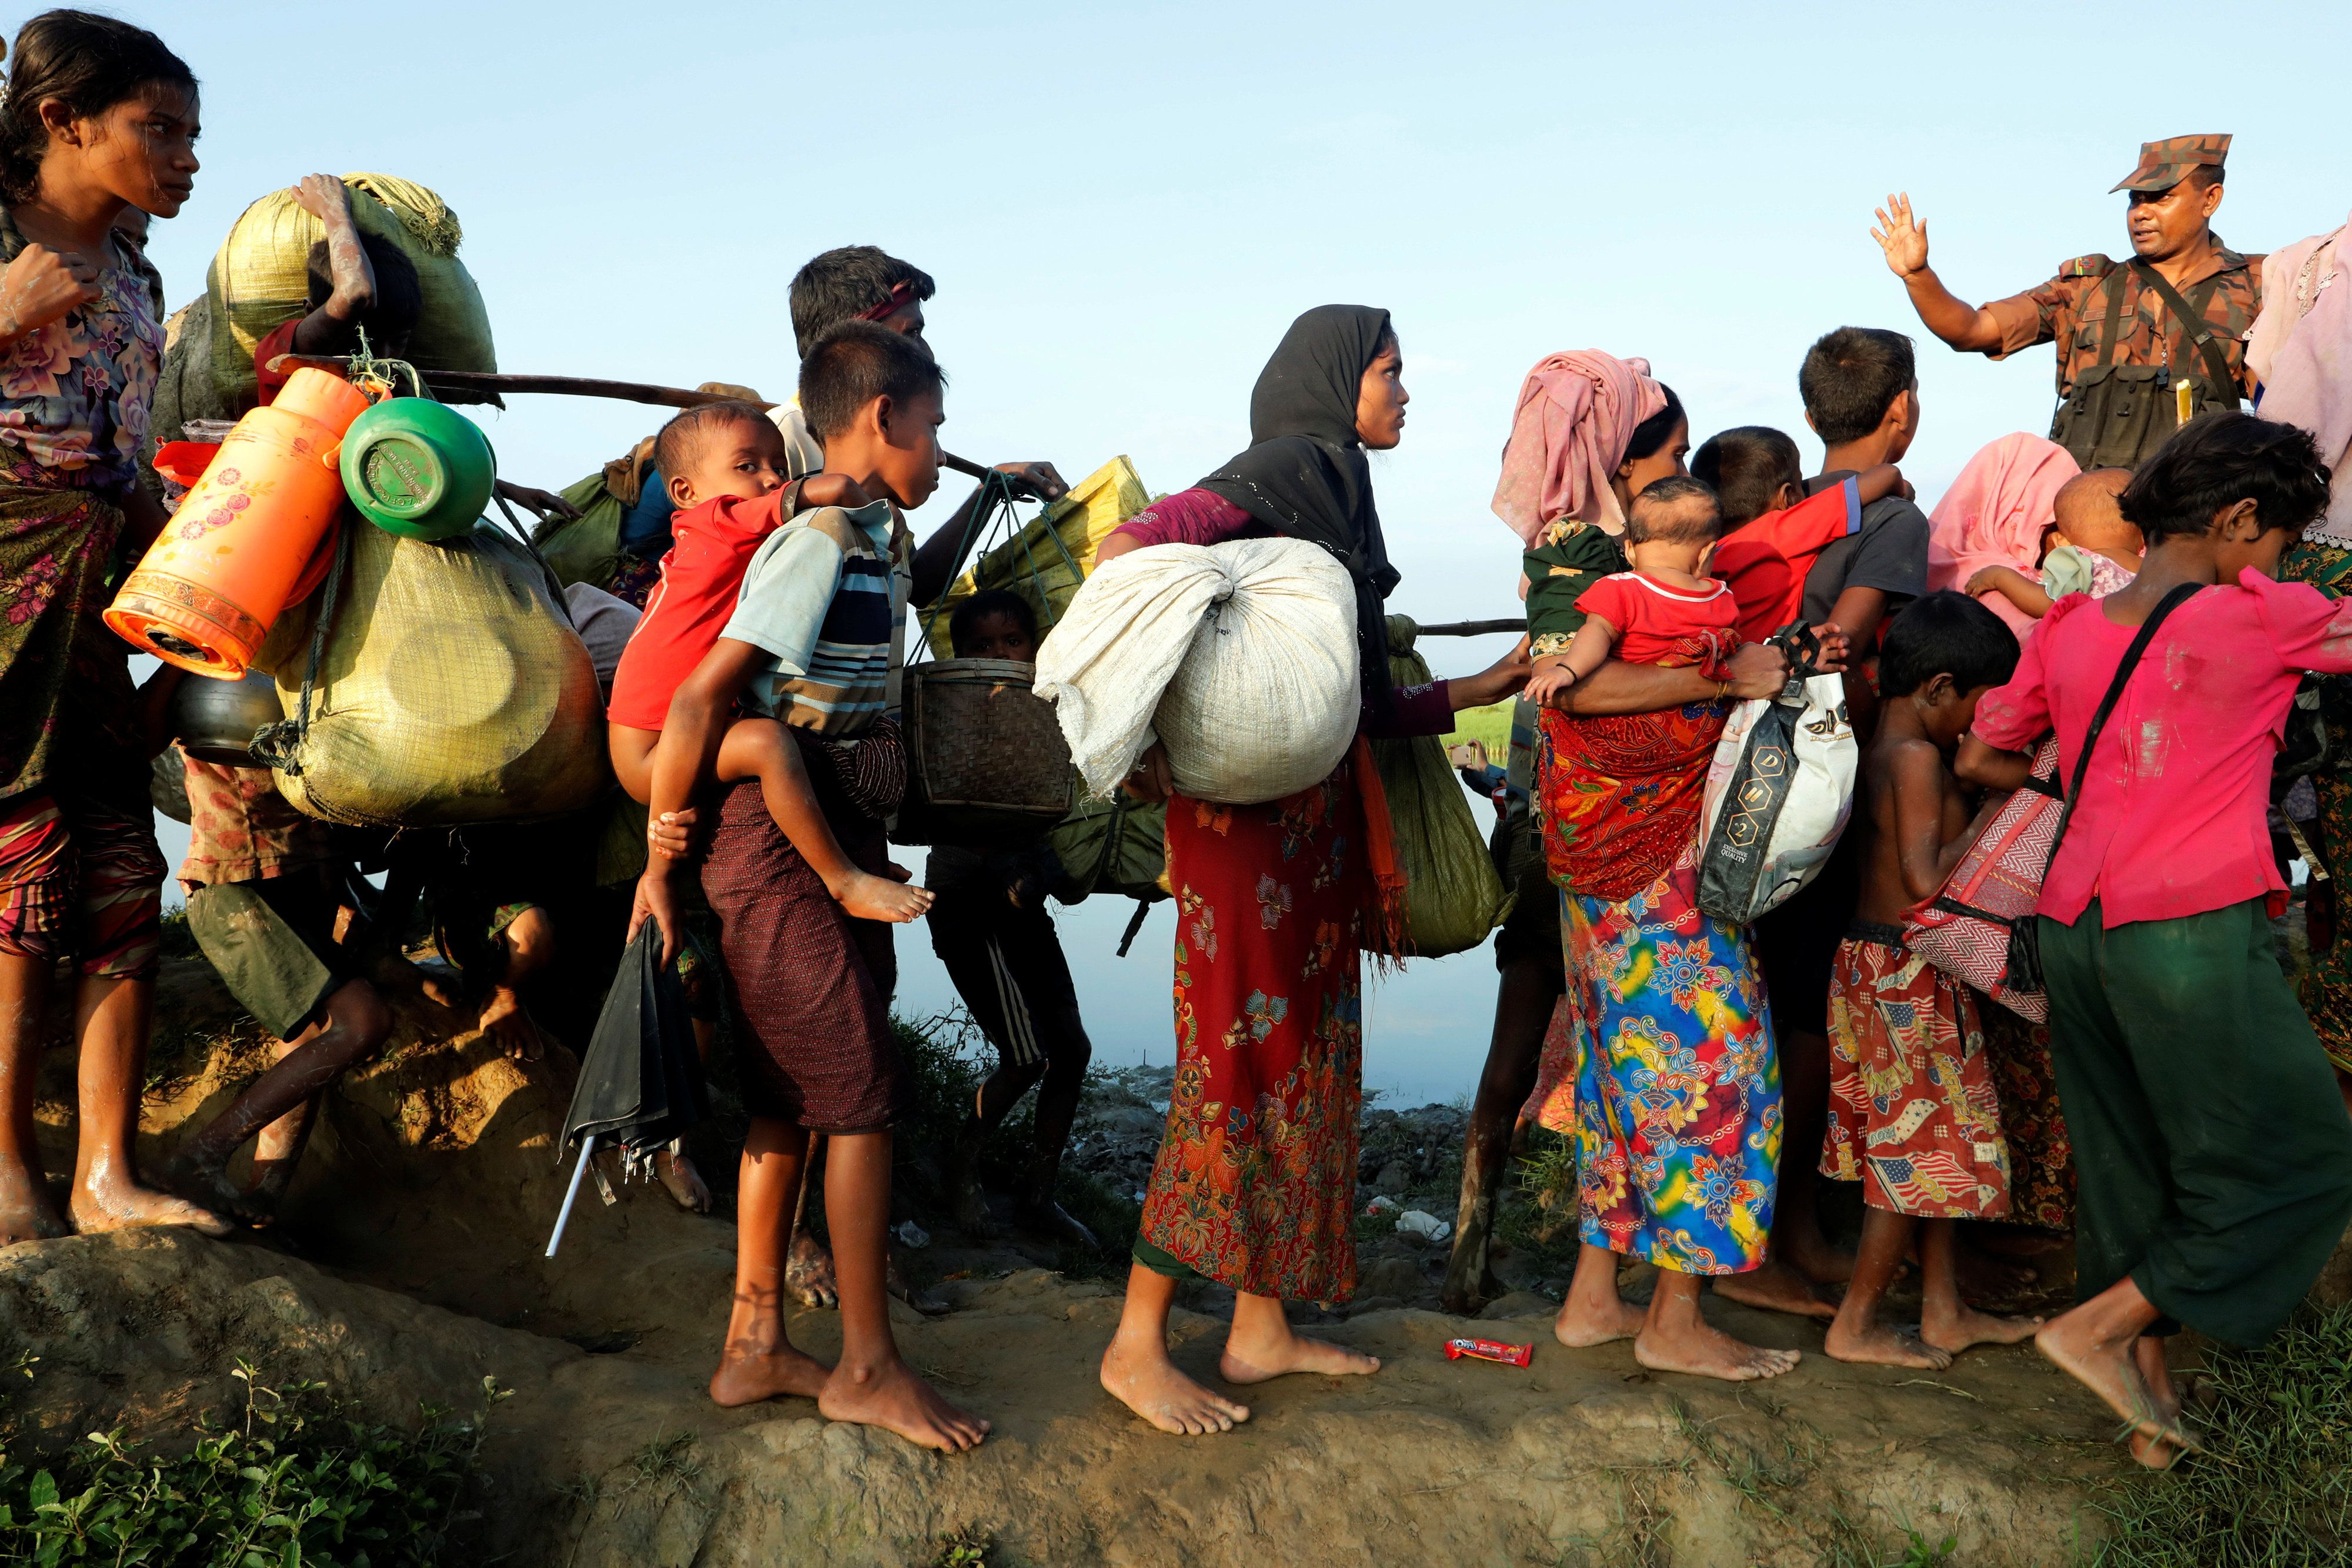 Rohingya refugees arrive to the Bangladeshi side of the Naf river after crossing the border from Myanmar, near Palang Khali, Bangladesh October 16, 2017. REUTERS/Jorge Silva